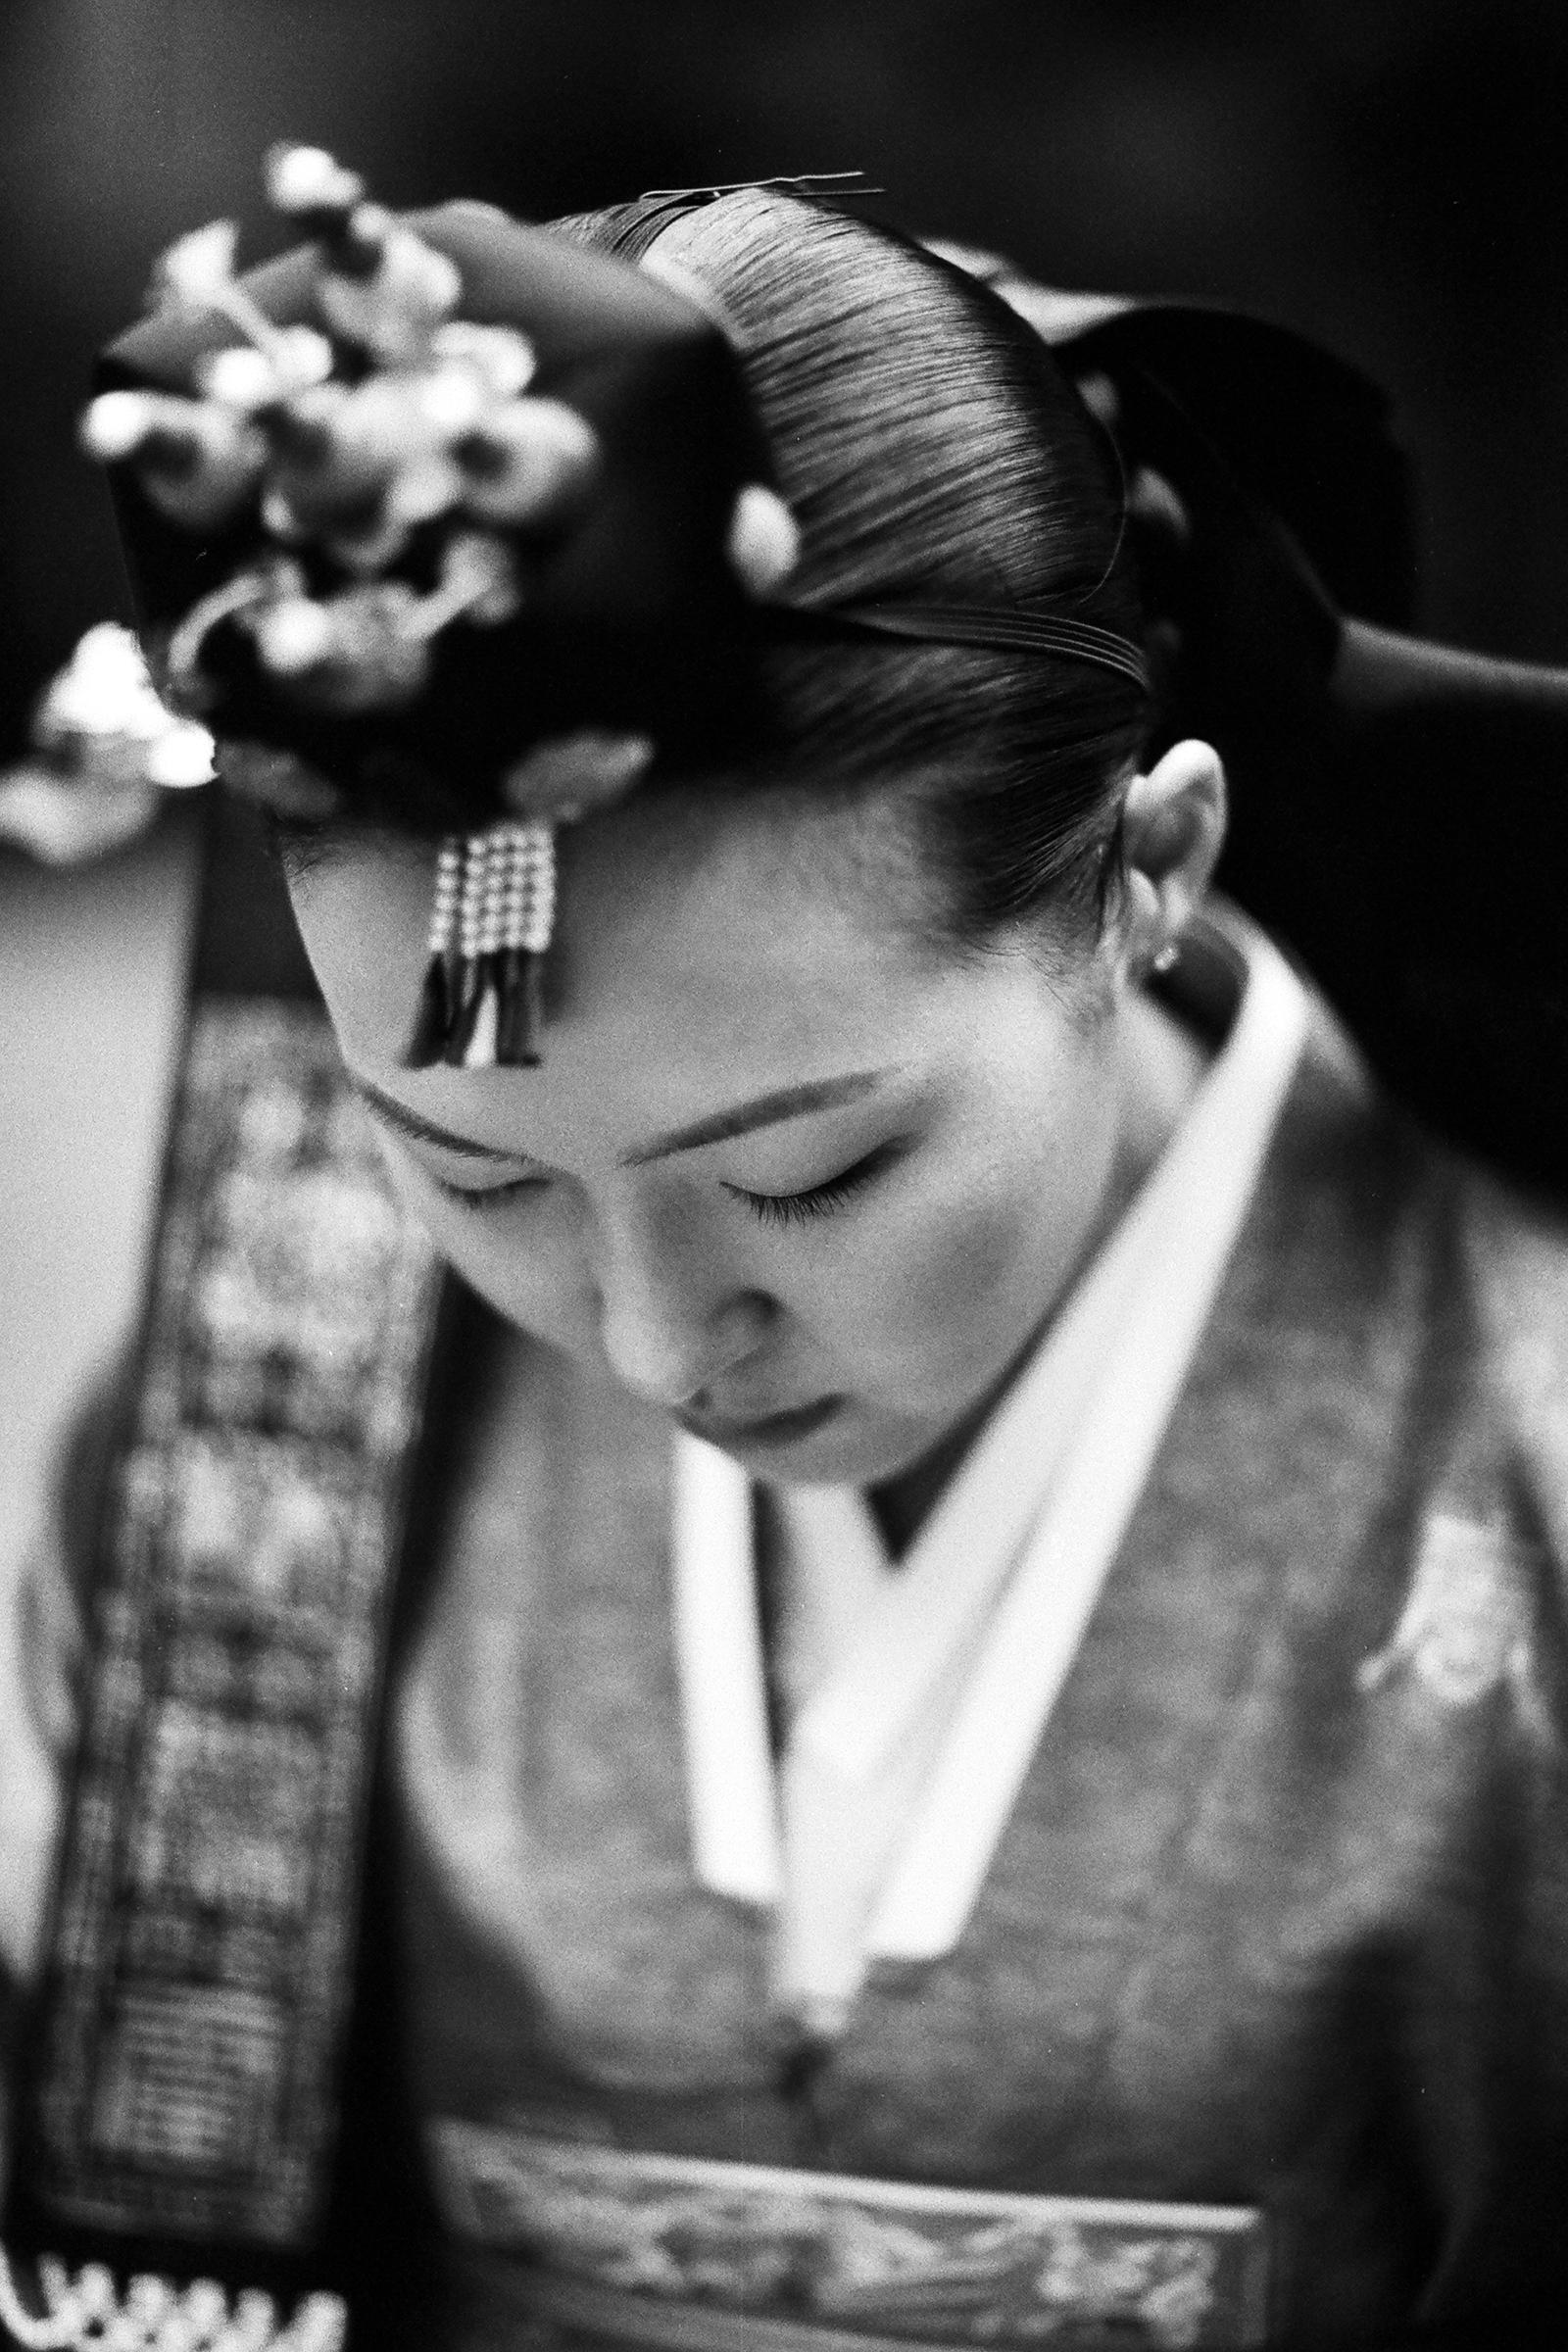 traditional-japanese-bride-head-bowed-bradley-hanson-photography